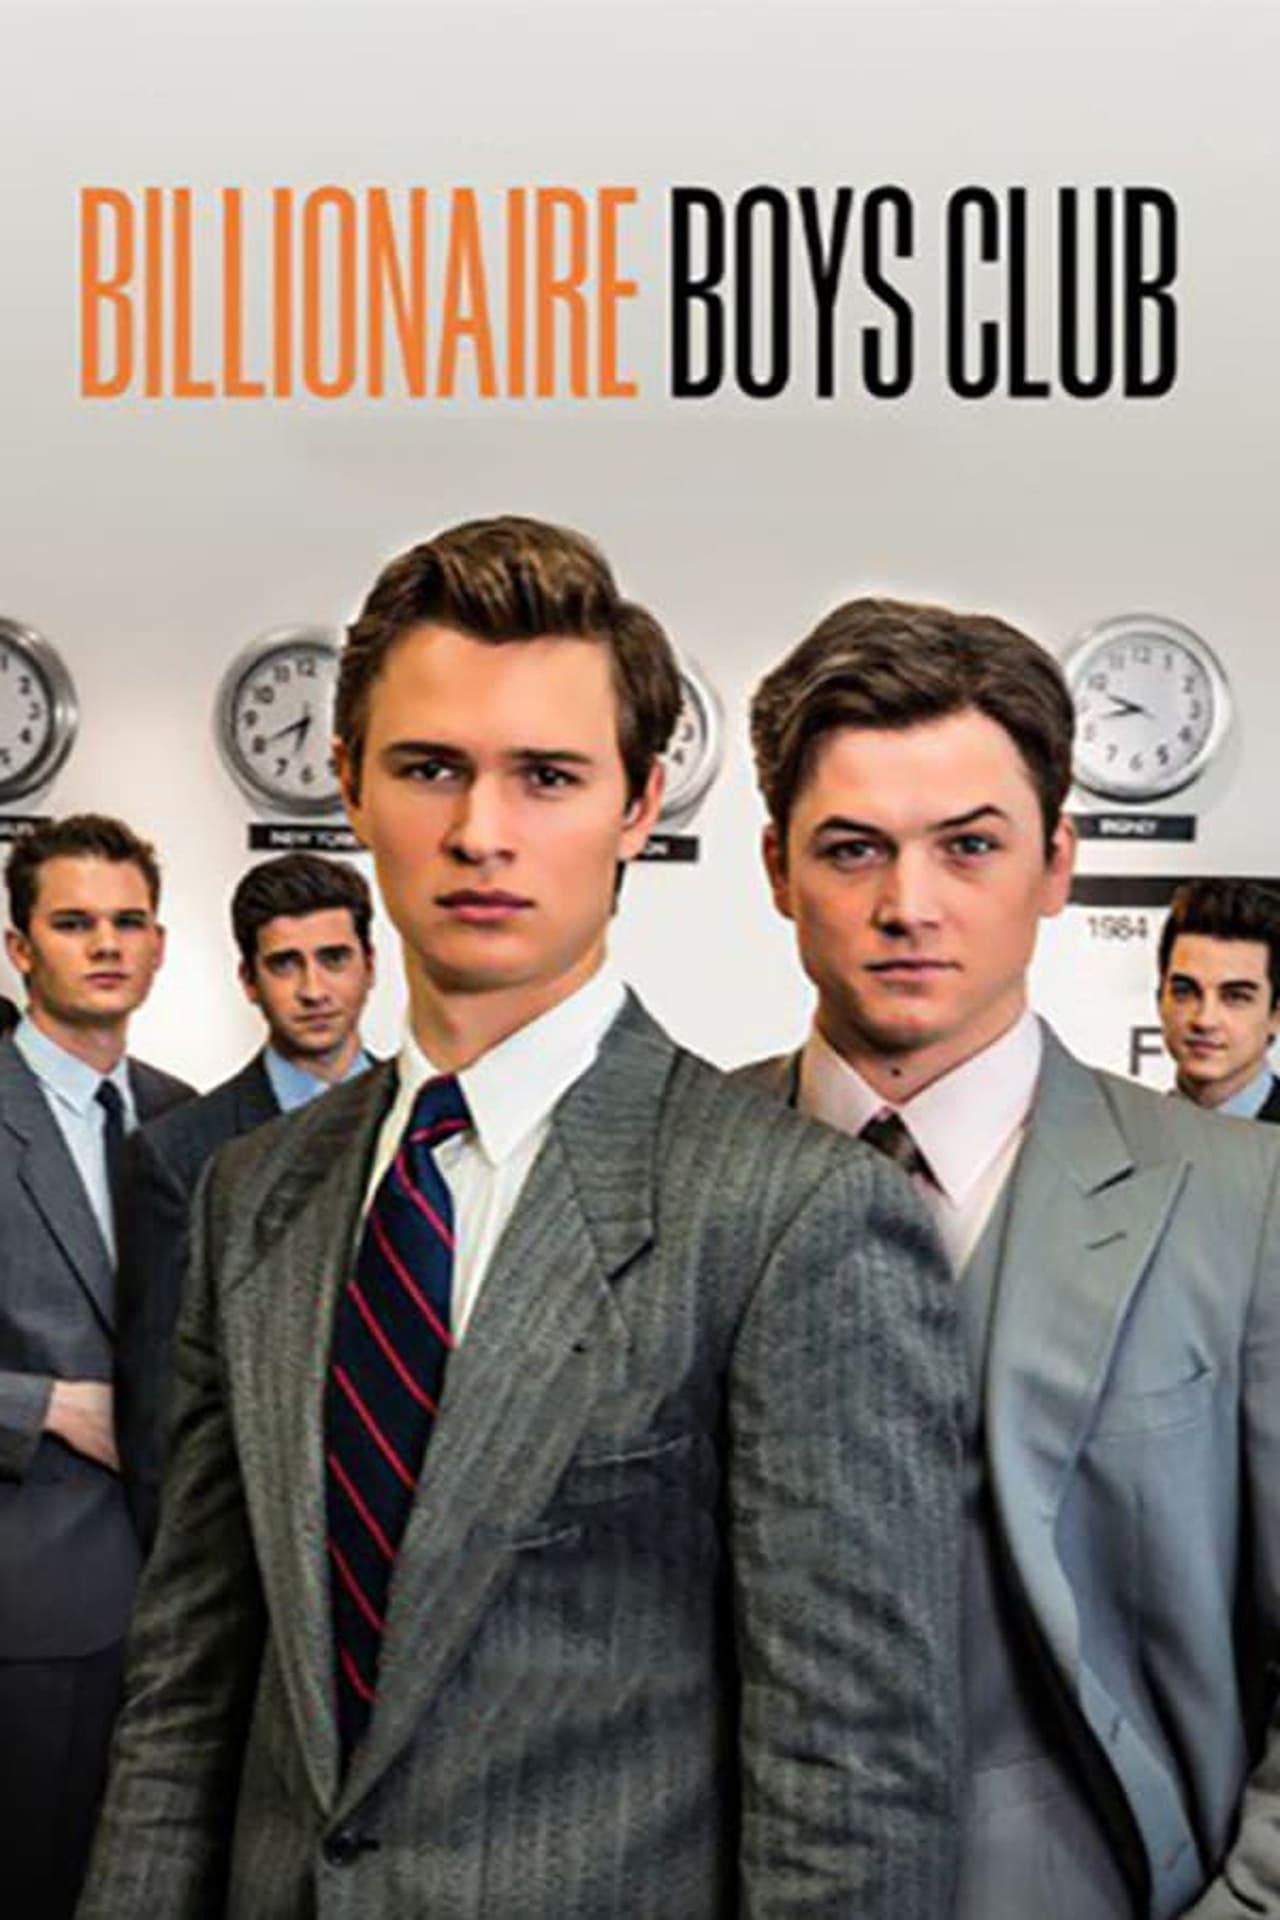 Billionaire Boys Club Film